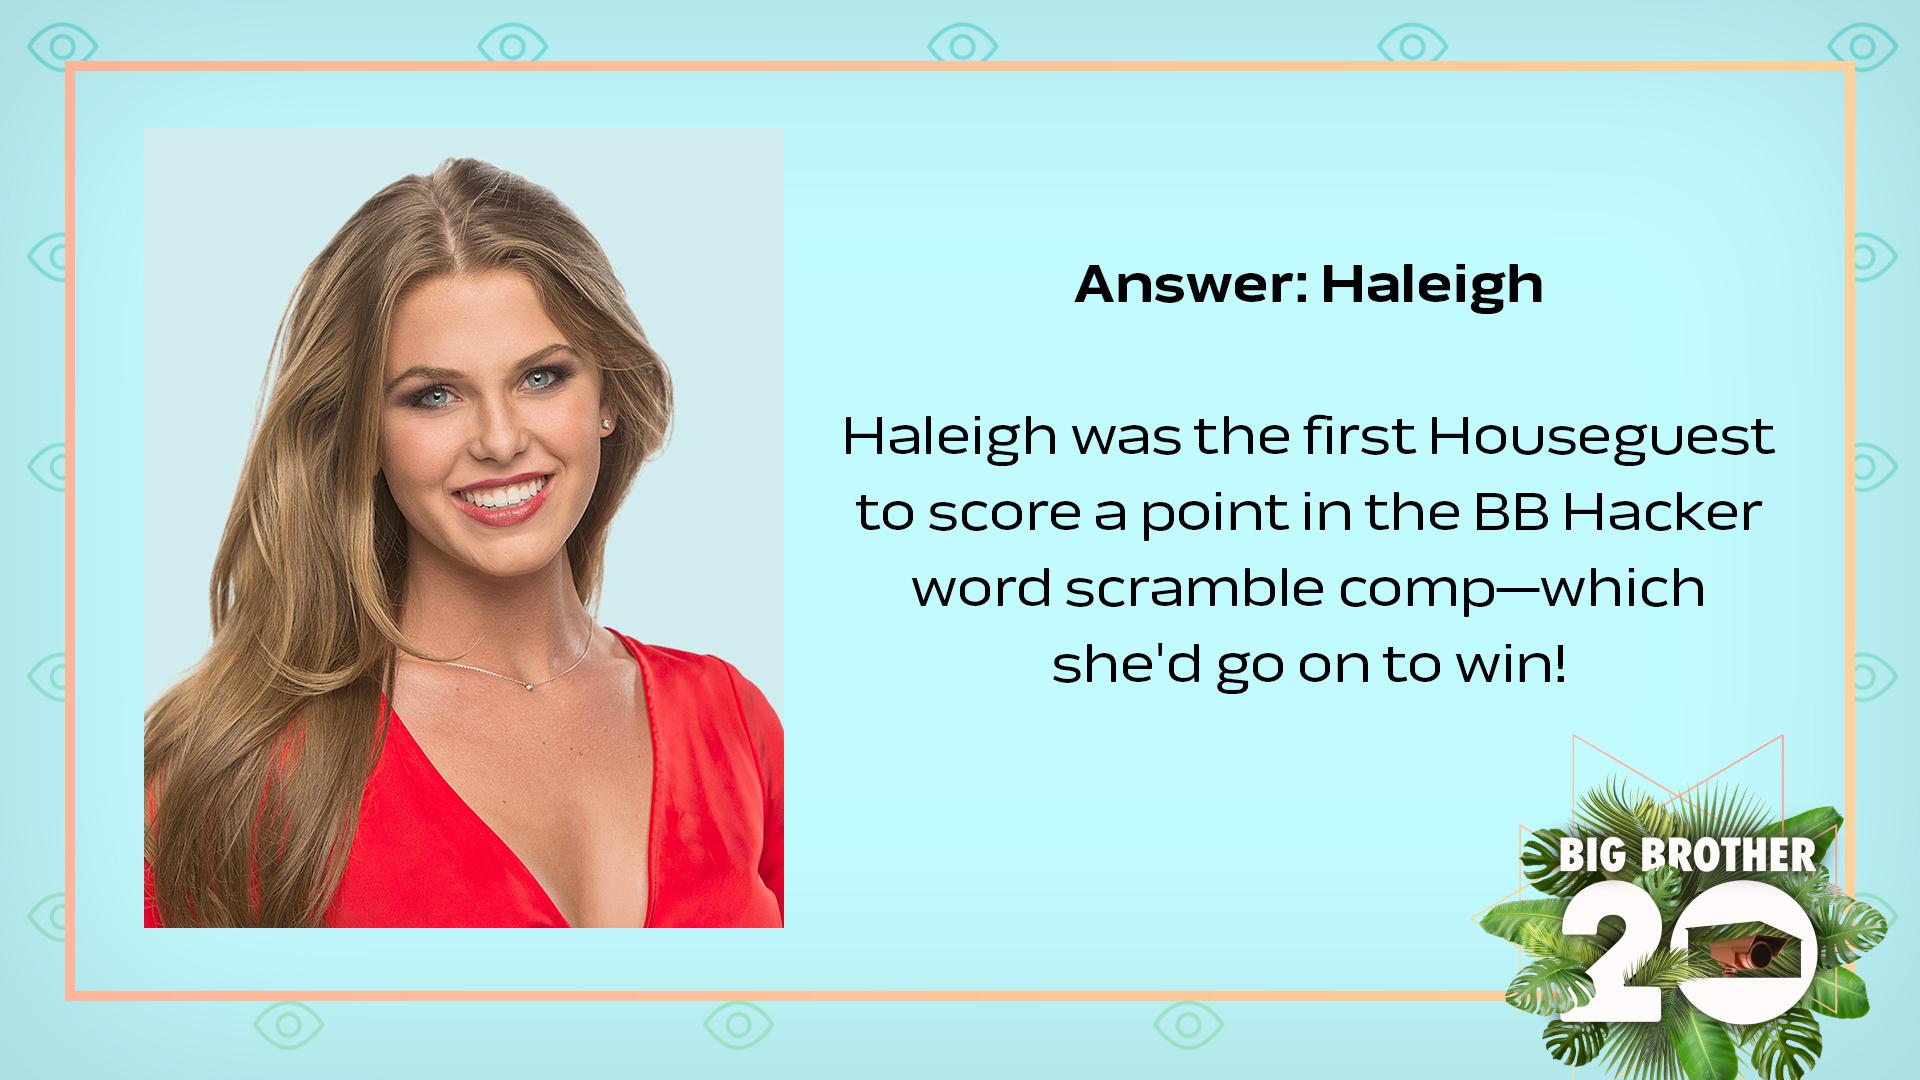 Answer: Haleigh